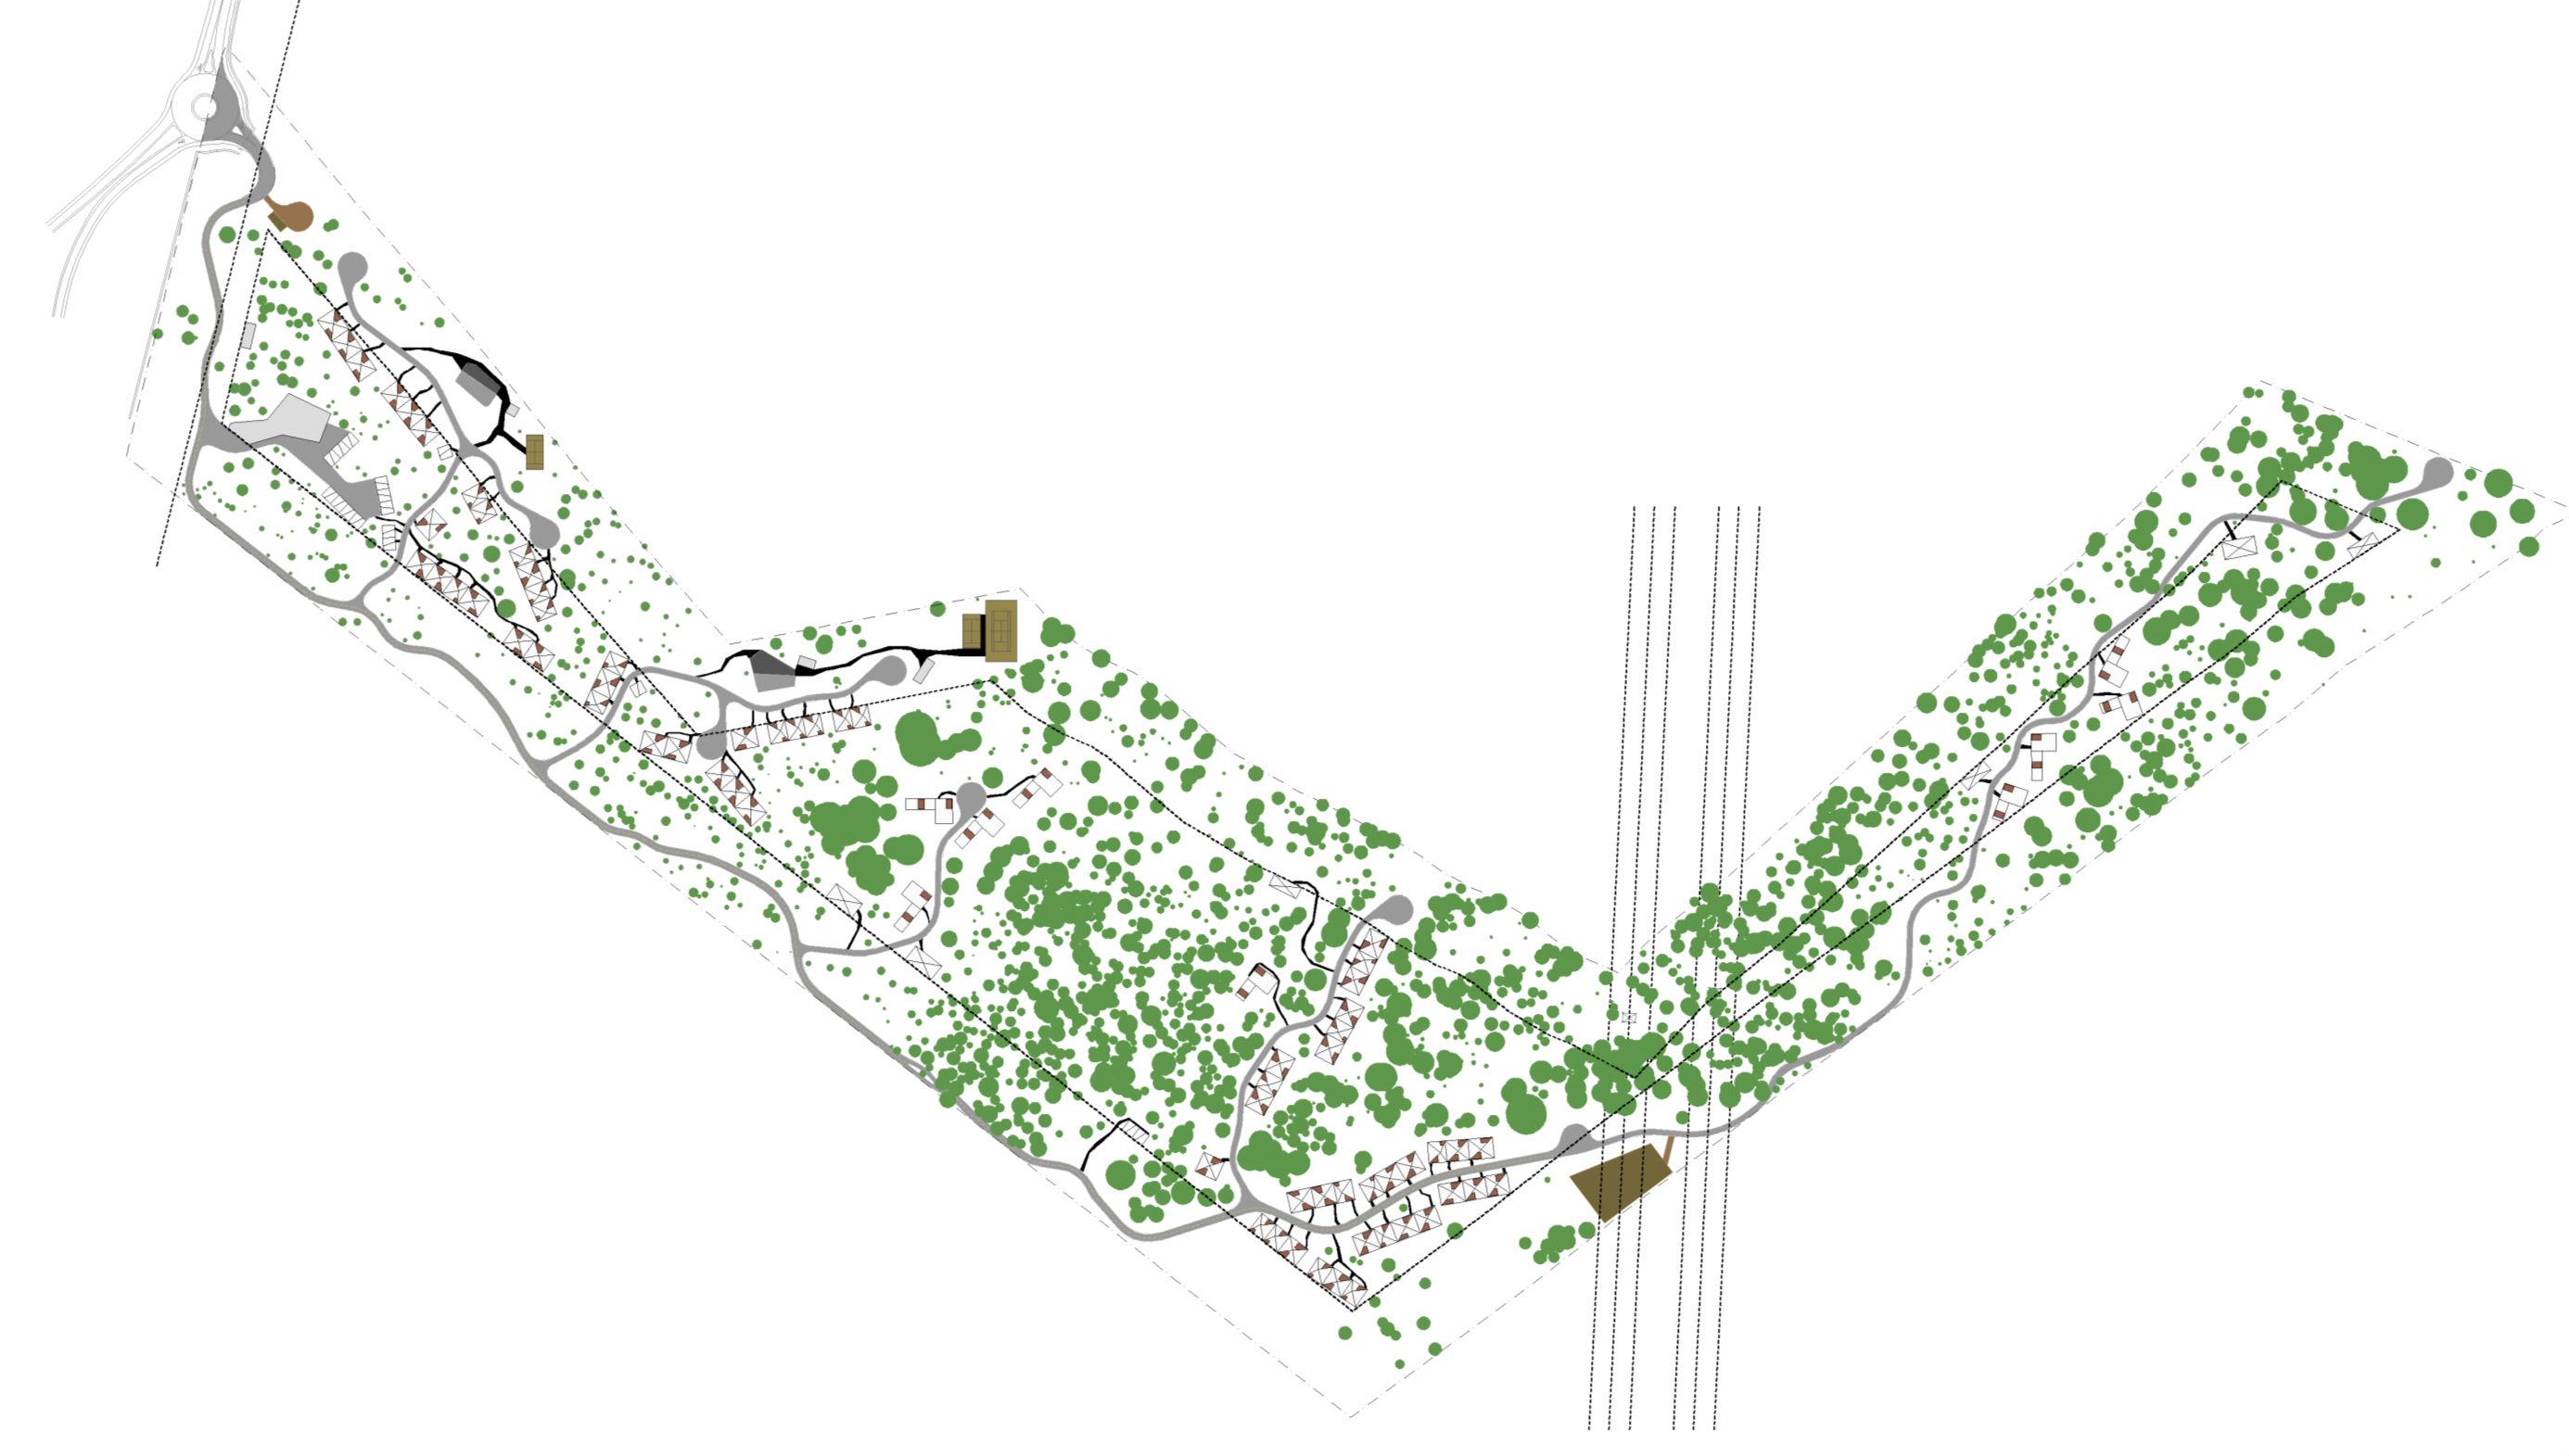 Trifólio/Estudo de Impacte Ambiental